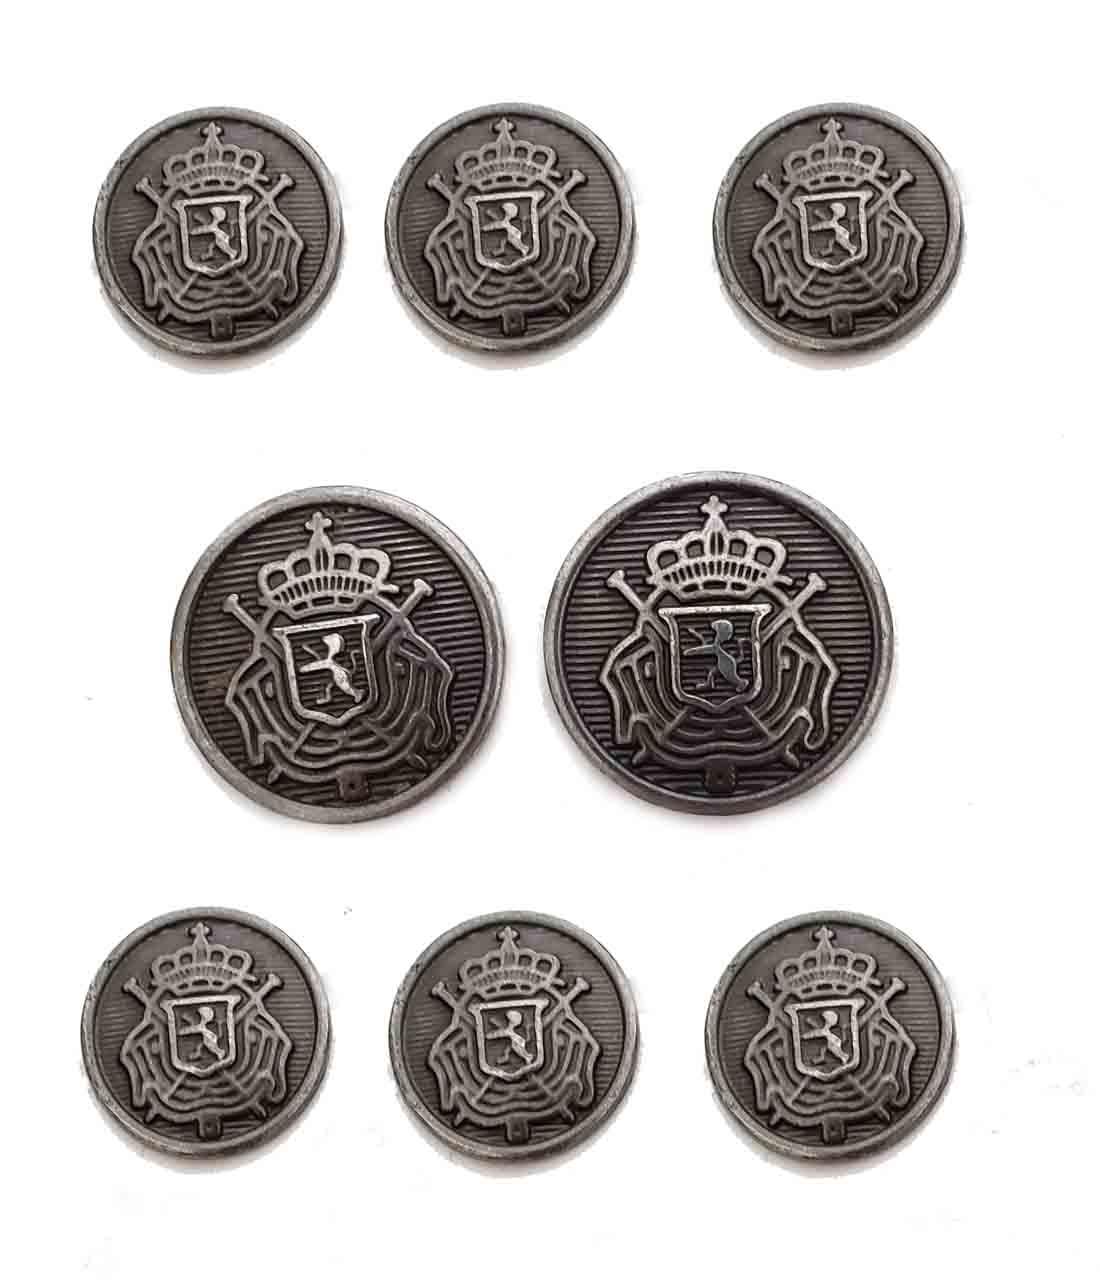 Waterbury Blazer Buttons Gray Silver Belgian Crest Shank Men's